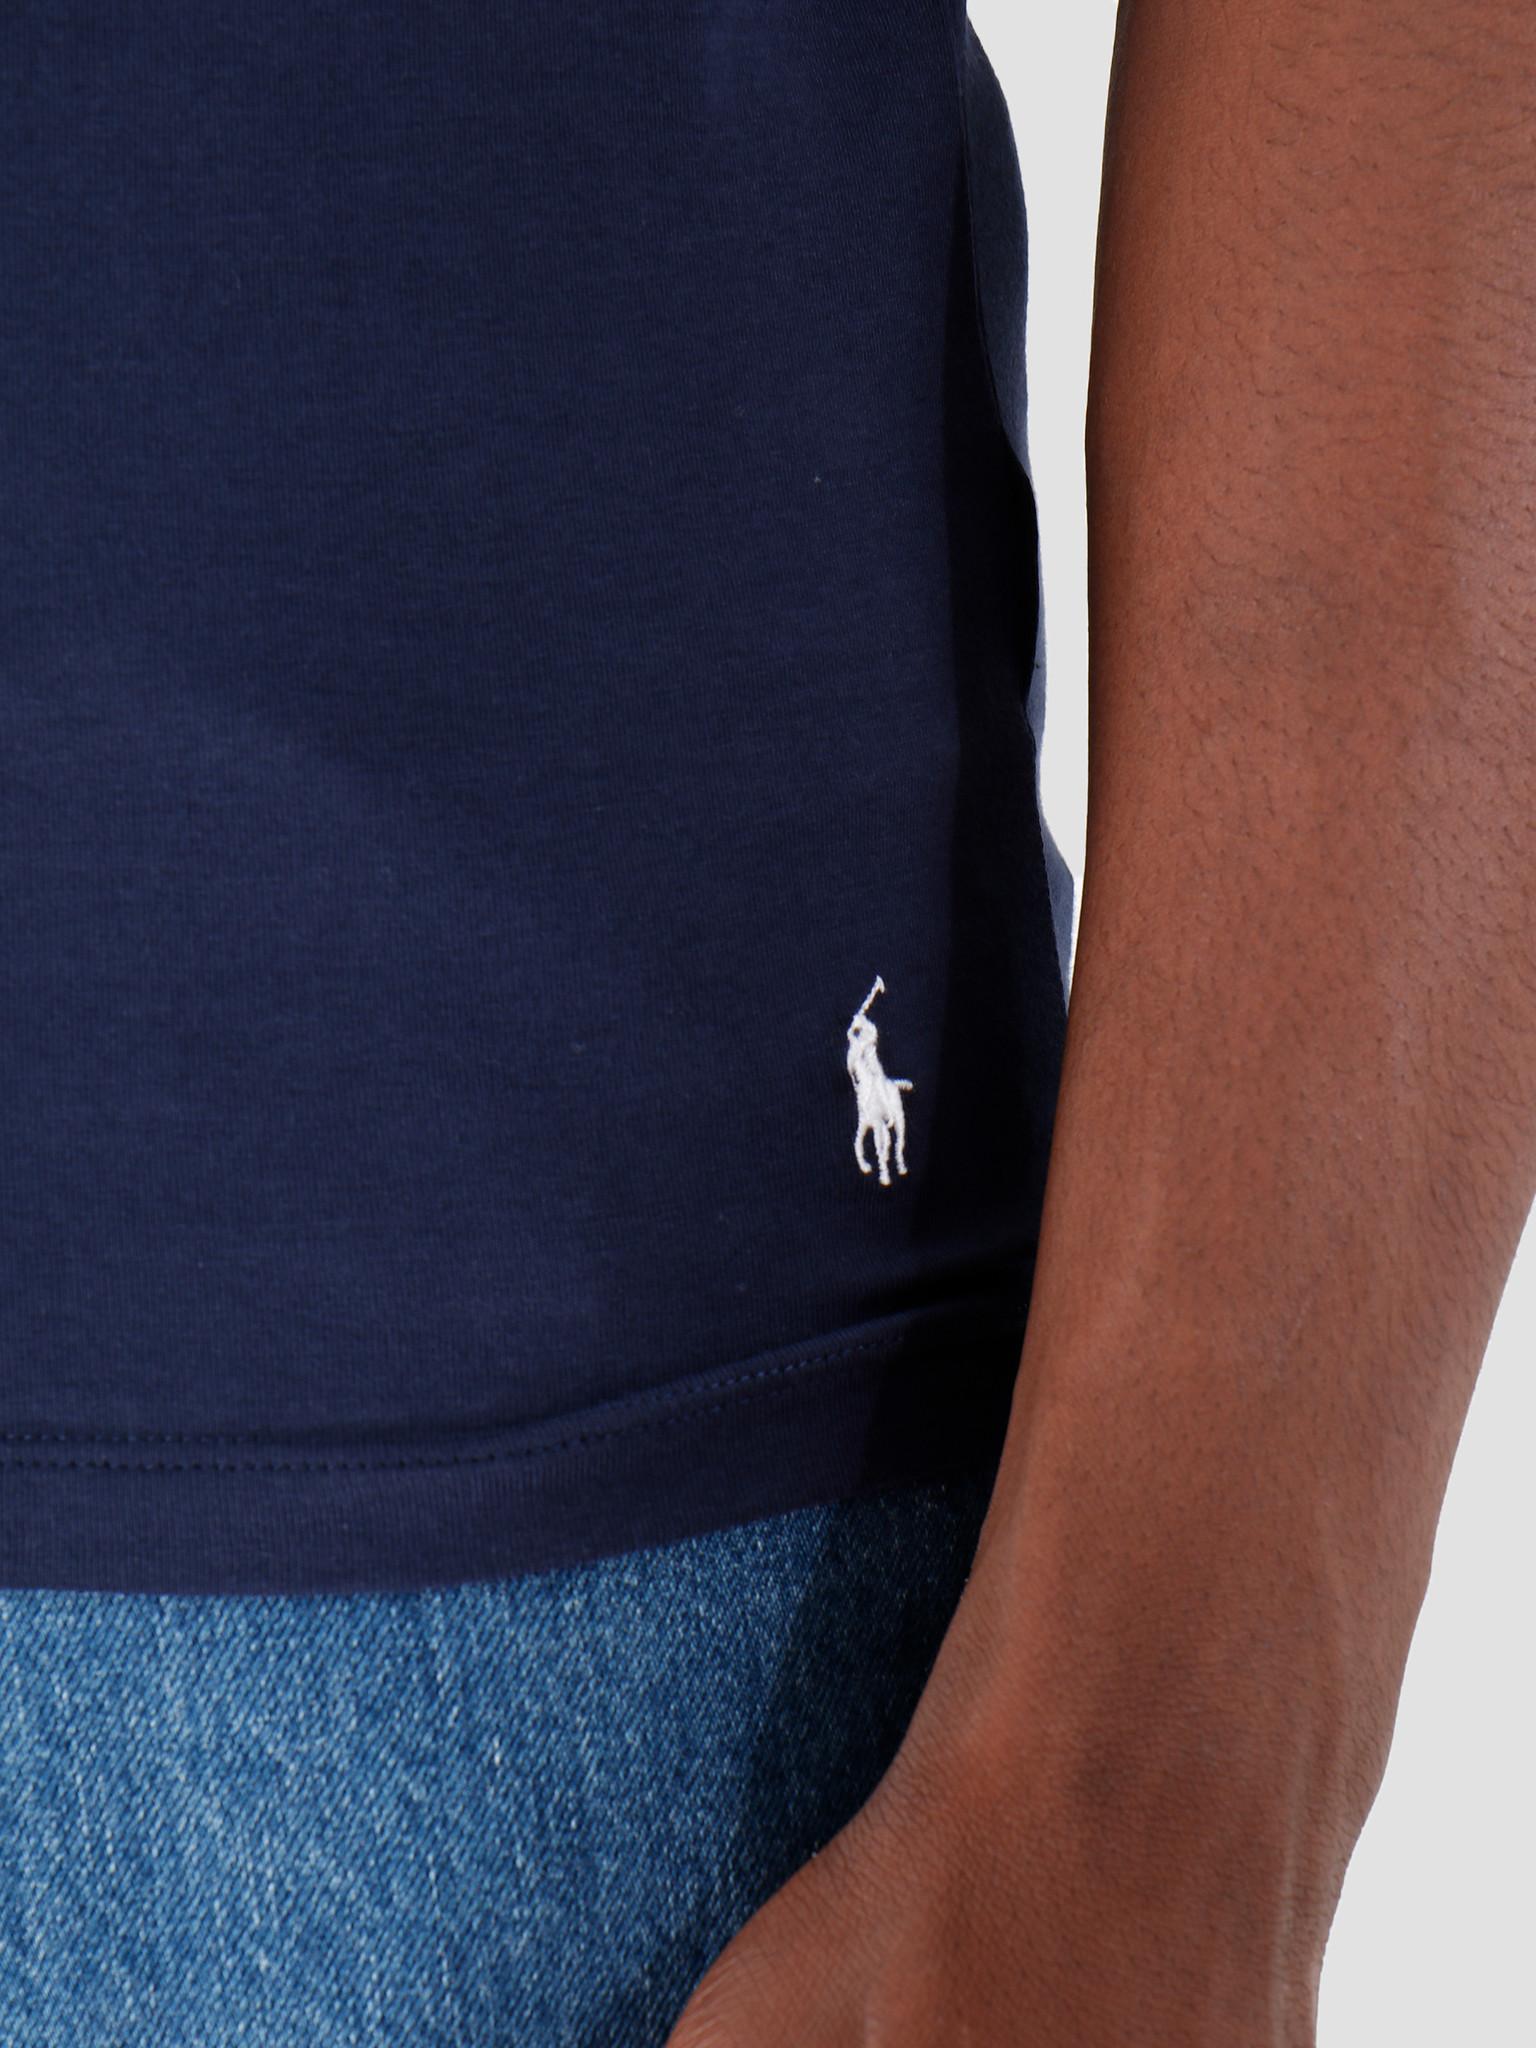 Polo Ralph Lauren Polo Ralph Lauren Classic 2 Pack Crew Undershirt 2Pk Navy Navy 714621944004